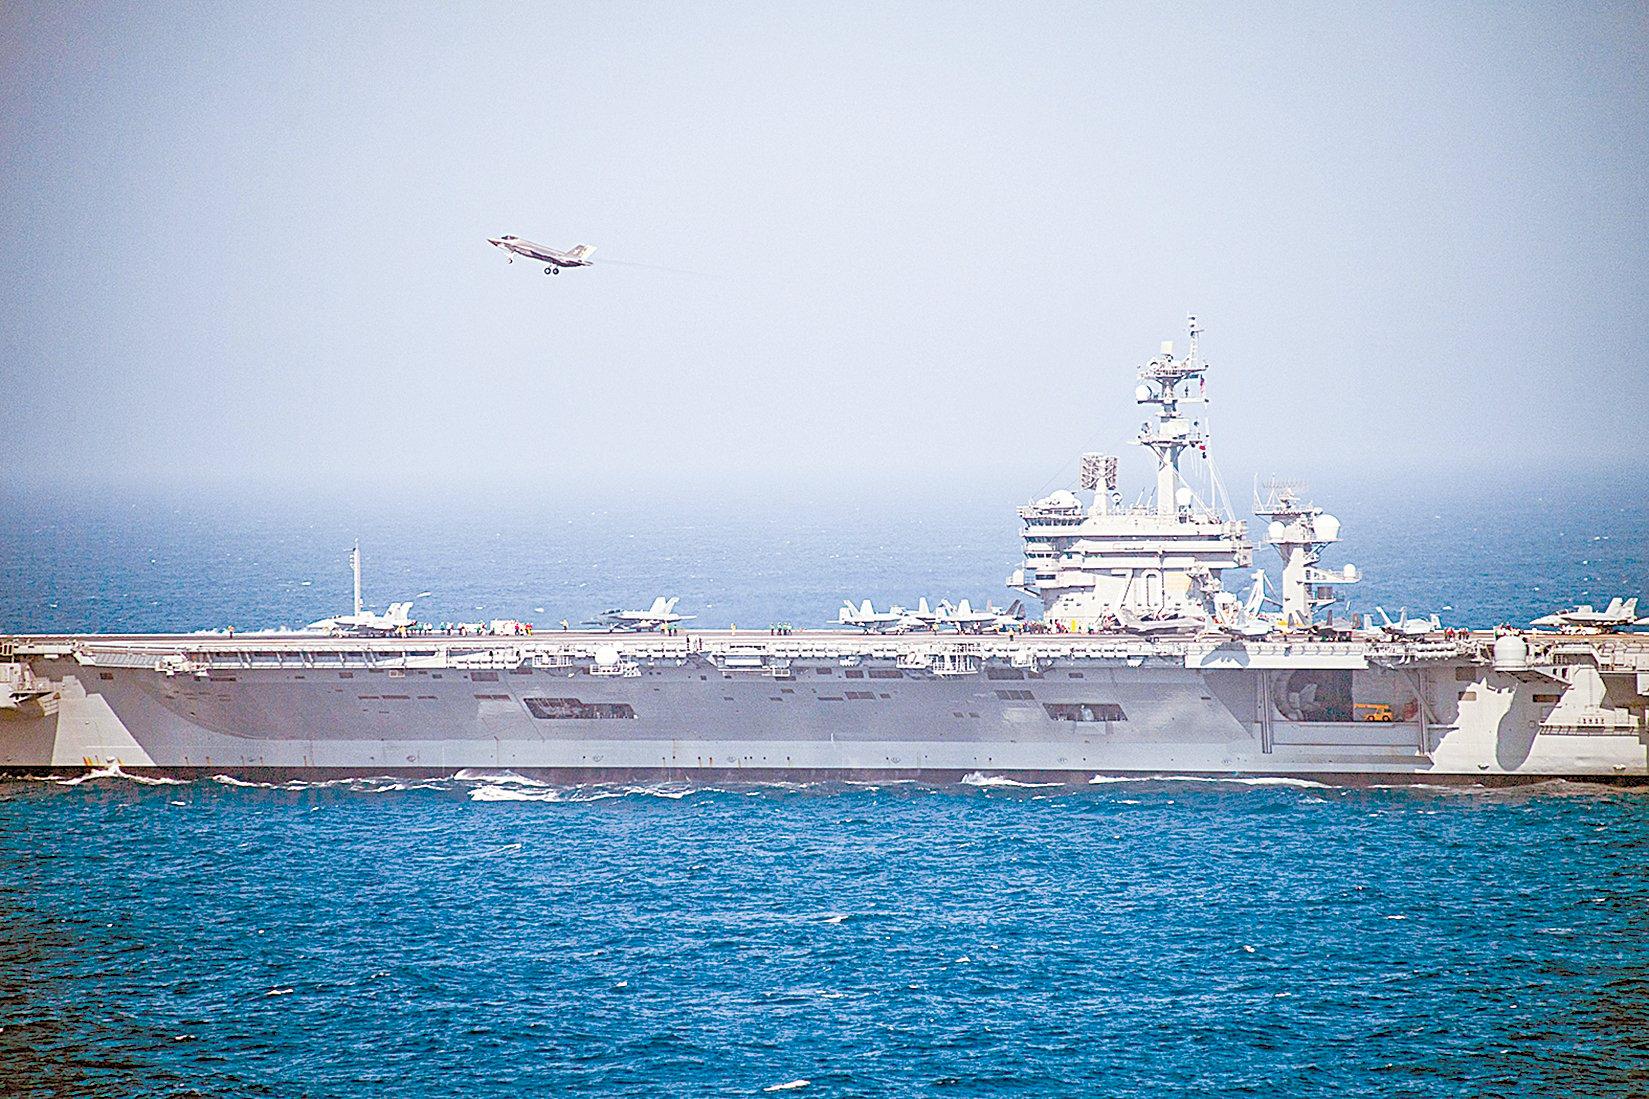 2020年9月16日, F-35C閃電II( Lightning II)戰機在卡爾文森號航母(CVN 70)上方飛行,正在完成駕駛艙認證和航空母艦交通控制中心認證。(Mass Communication Specialist 3rd Class Michael A. Lee/美國海軍)